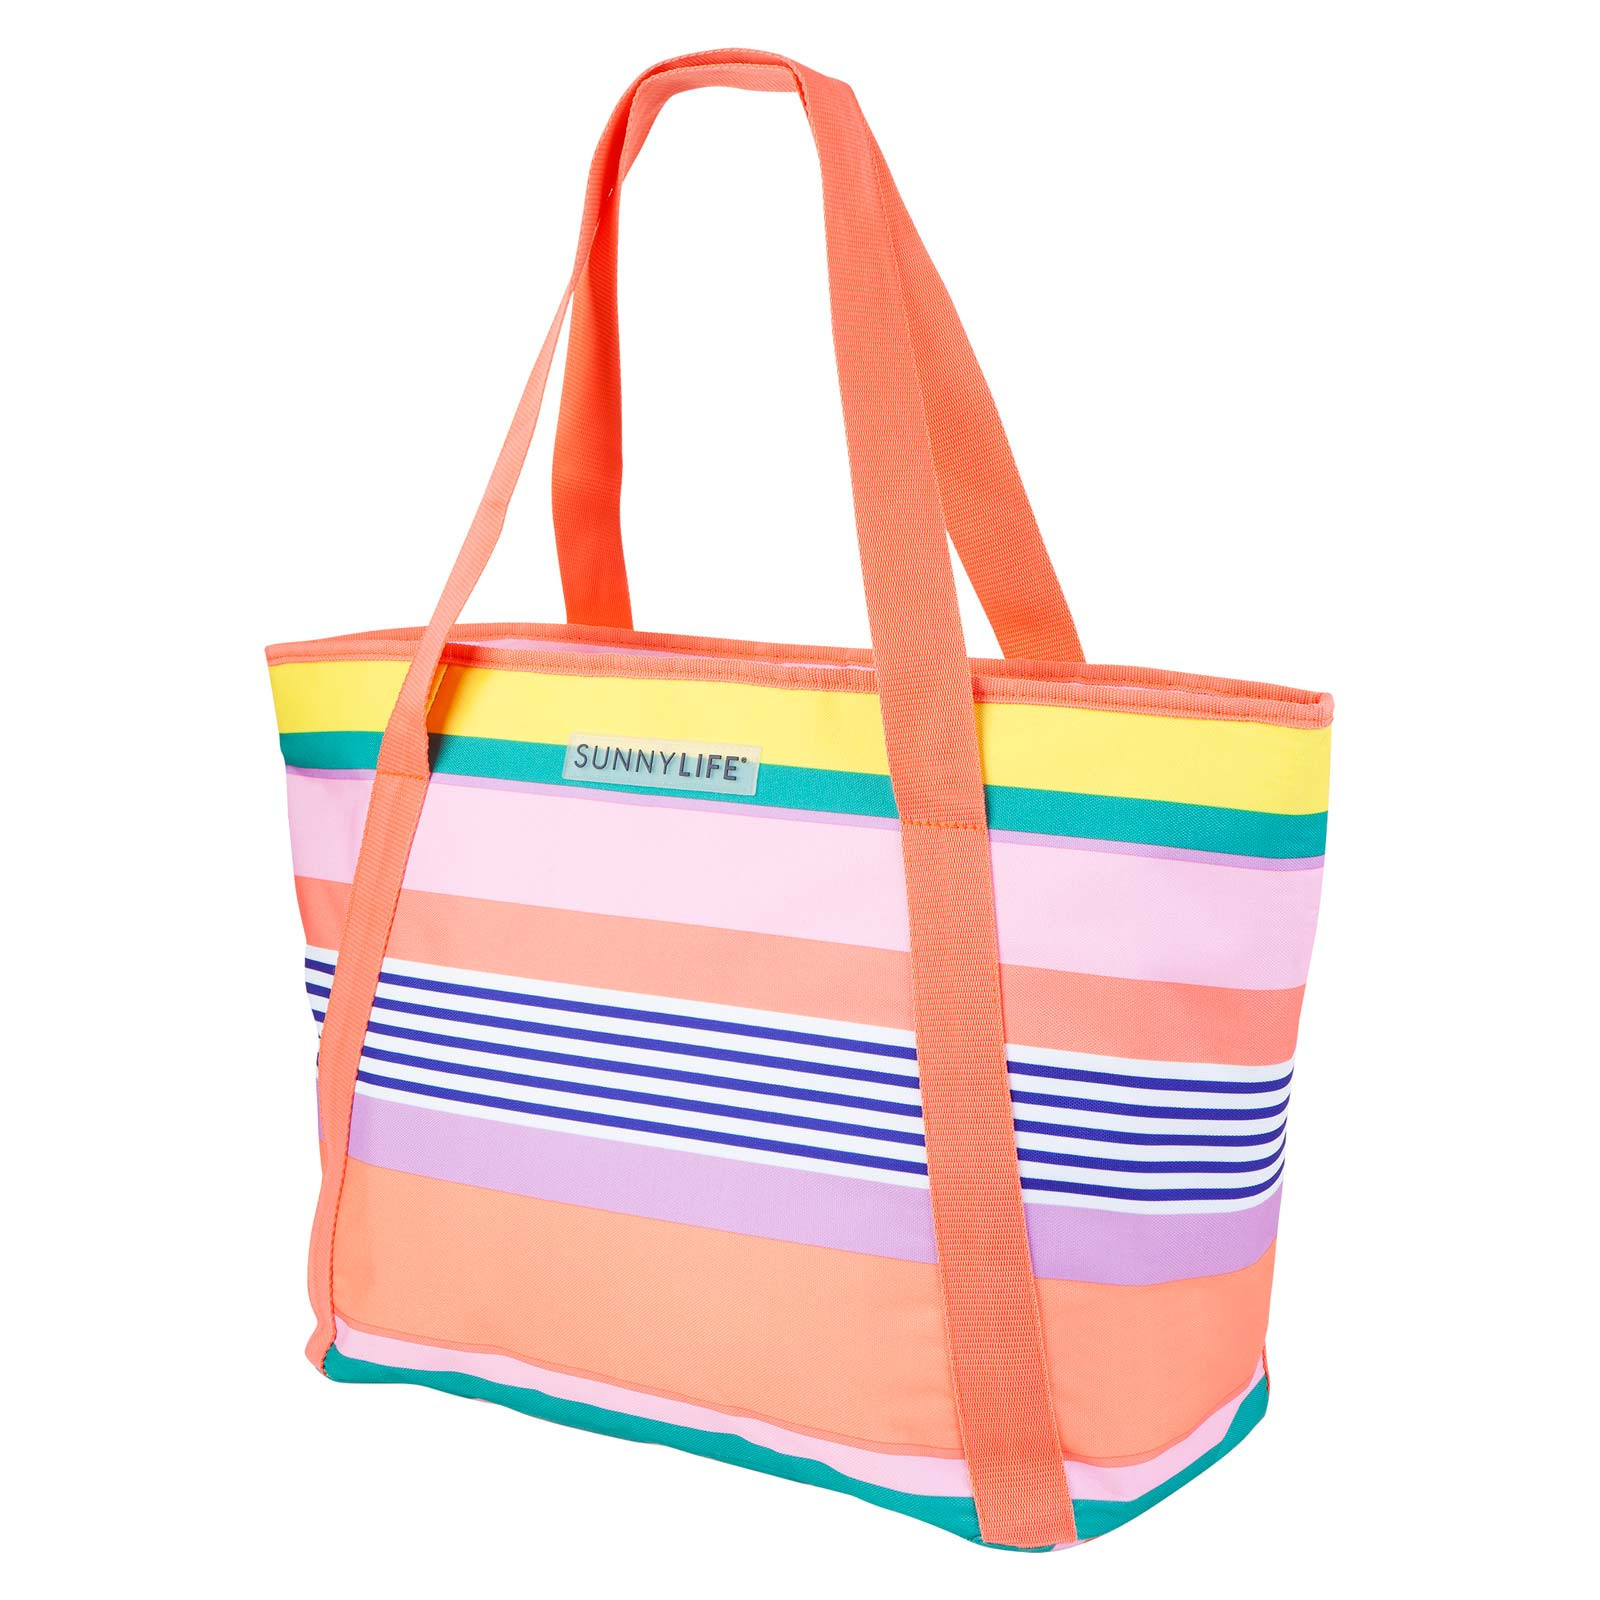 Sunnylife Colourful Striped Beach Cool Bag - Cooler Bag Havana